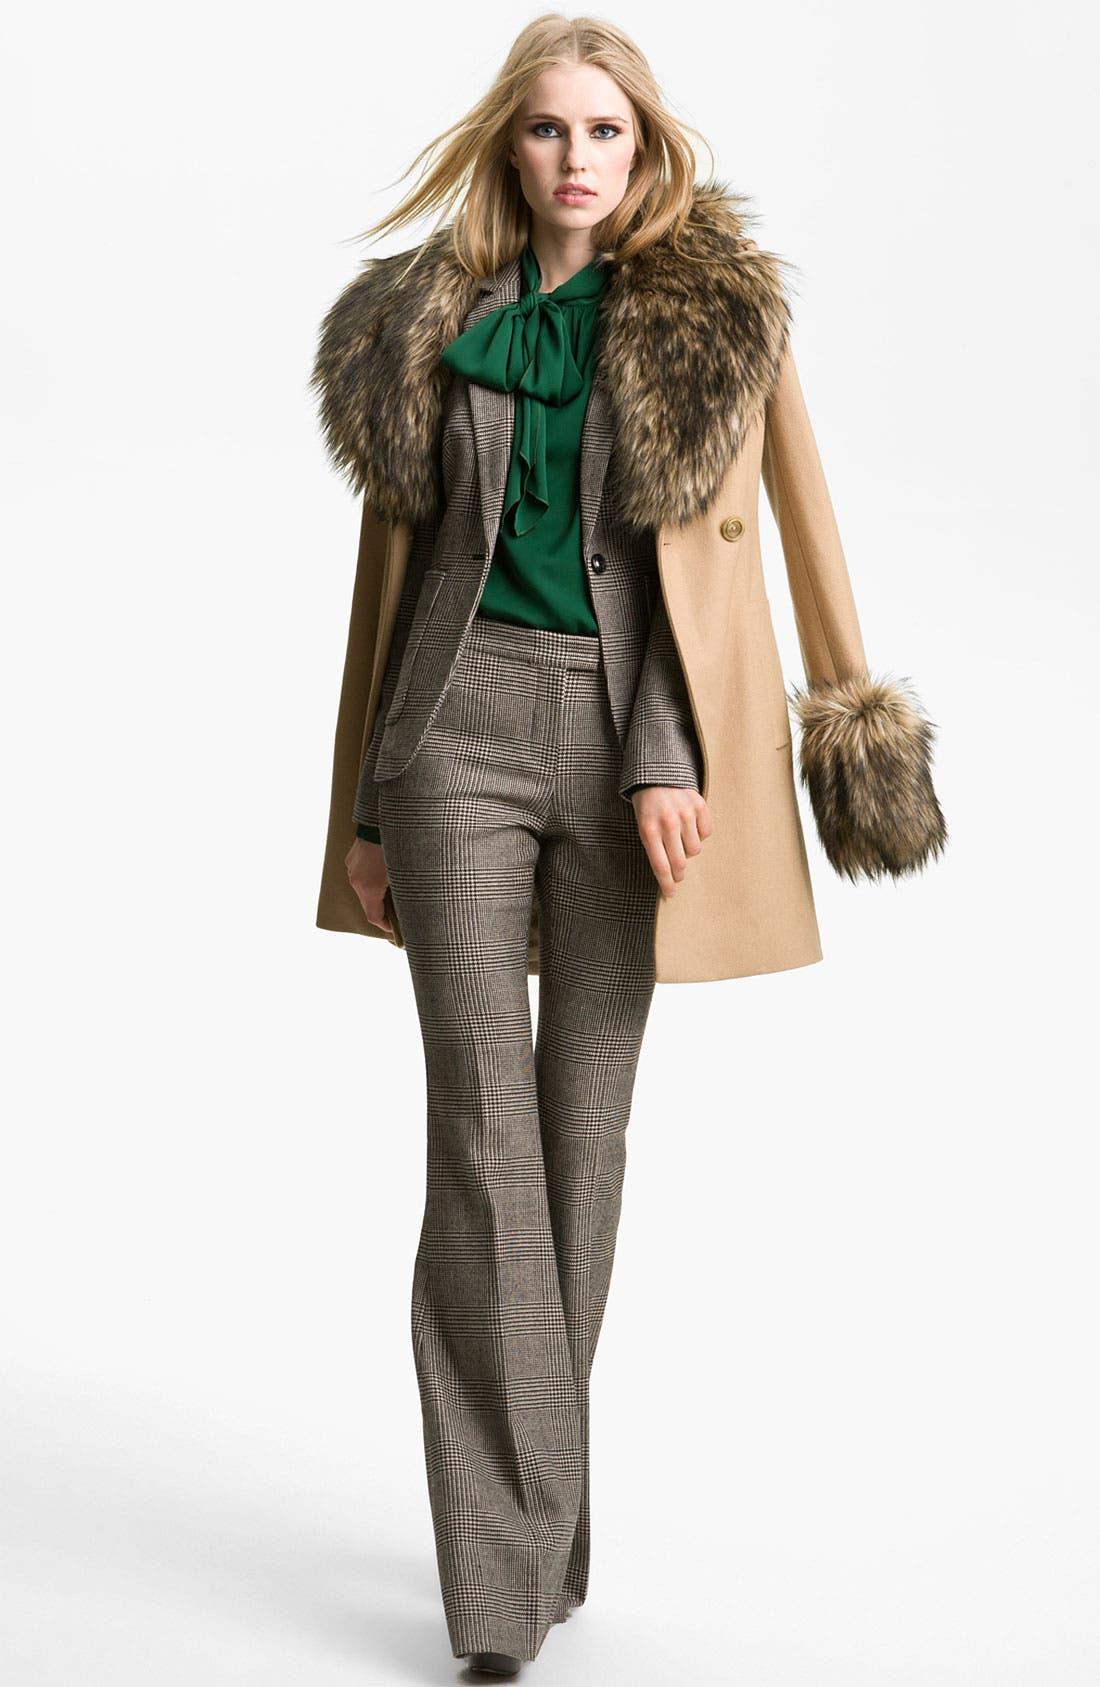 RACHEL ZOE 'Trish' Faux Fur Trim Peacoat, Main, color, 230